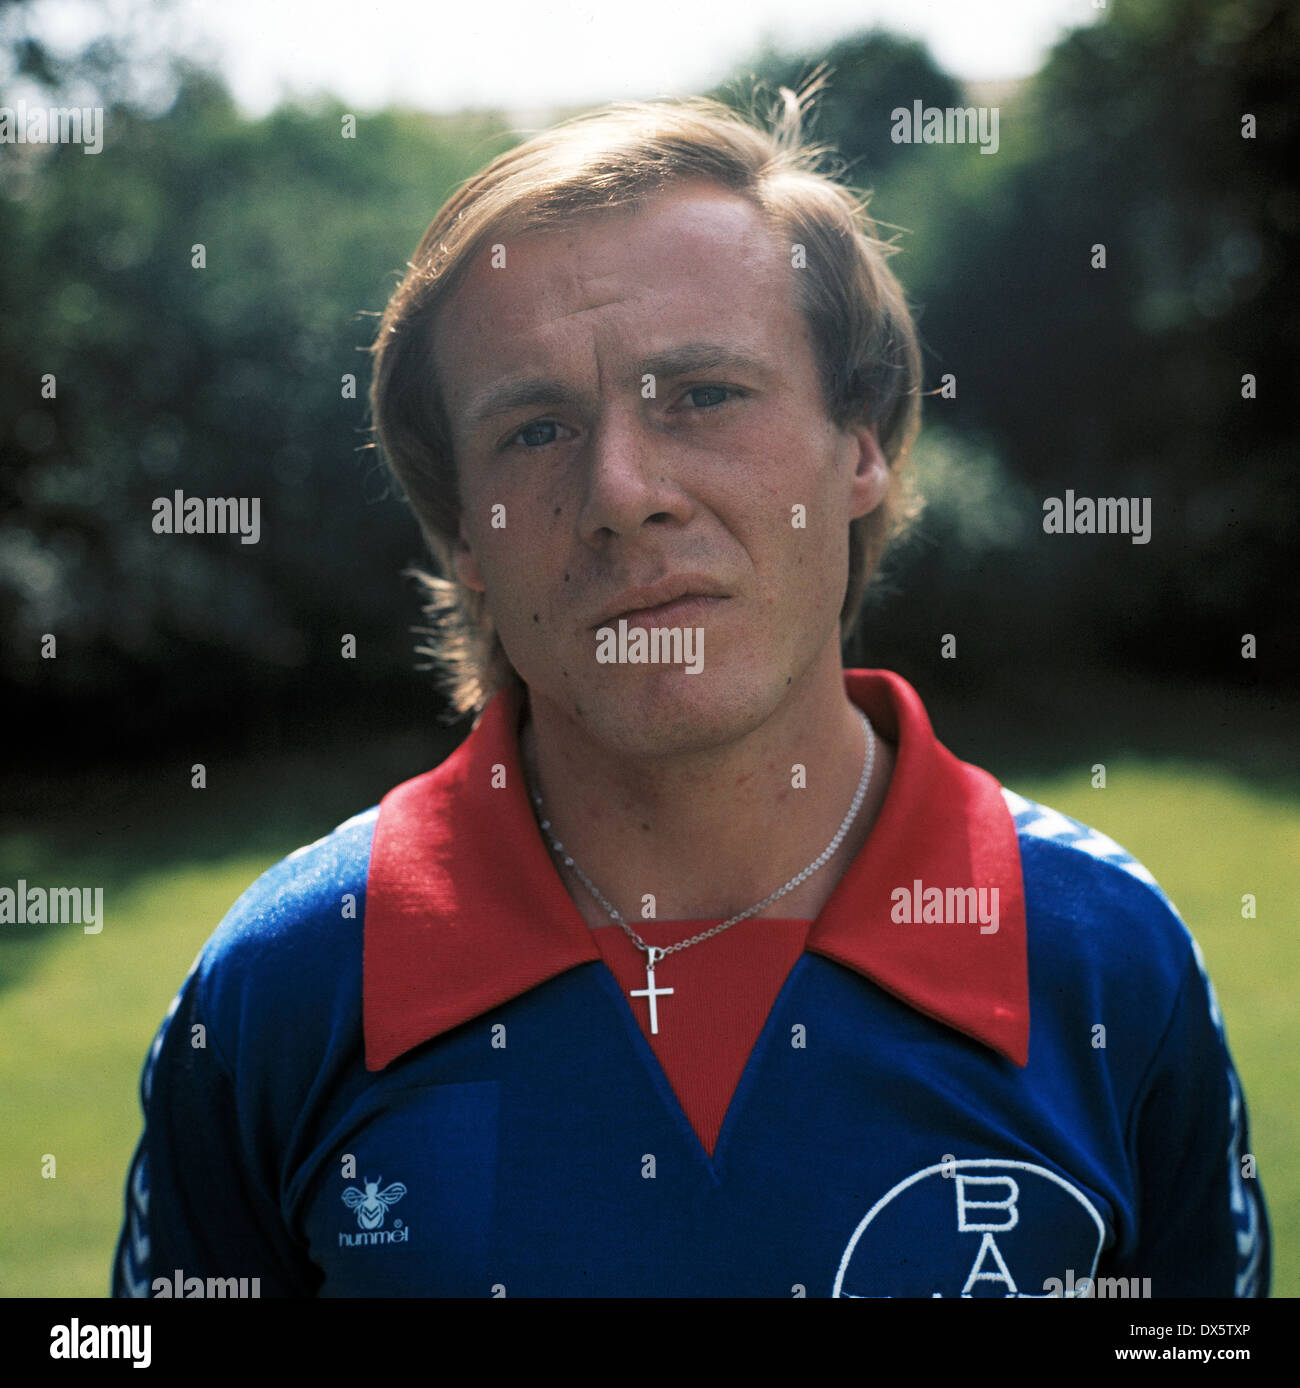 football, 2. Bundesliga Nord, 1977/1978, FC Bayer 05 Uerdingen, team presentation, portrait Horst Riege - Stock Image